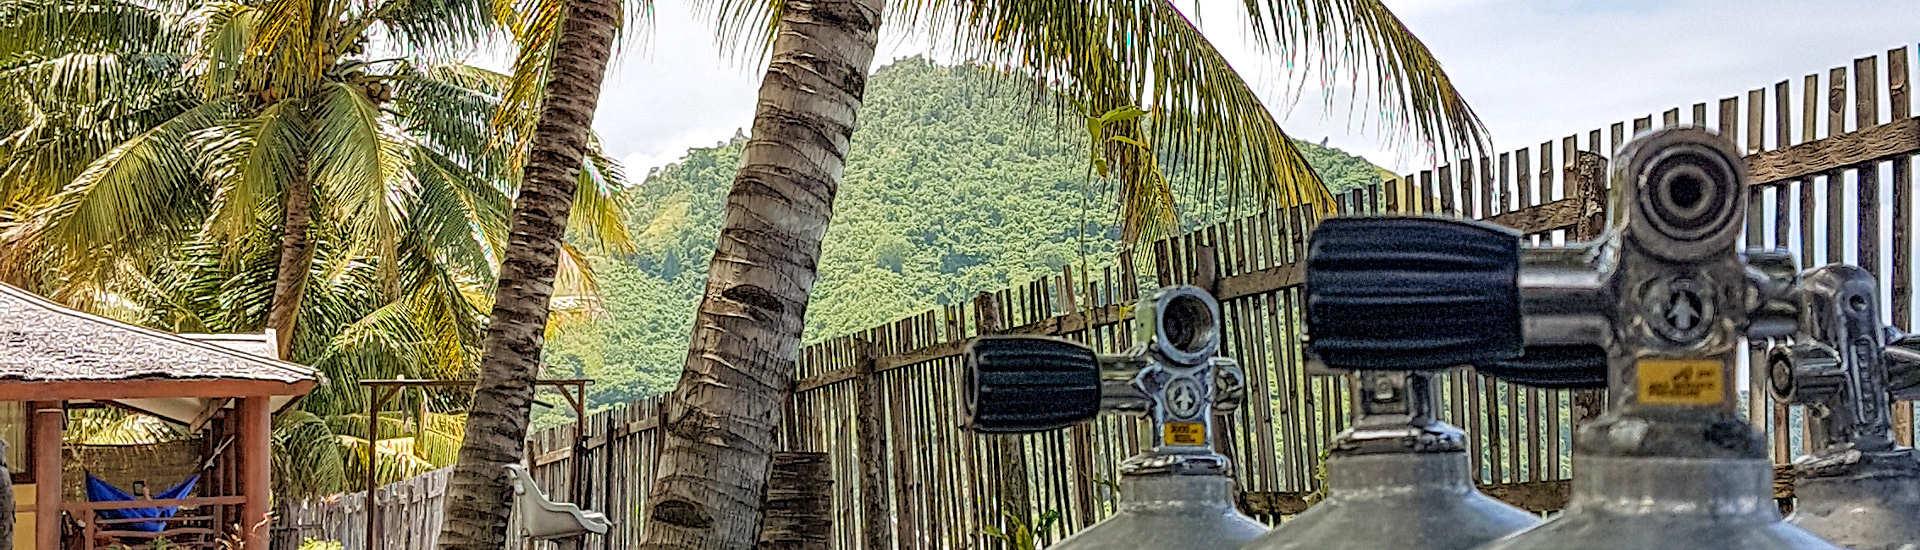 Tompotika Dive Lodge – Balantak, Indonesien